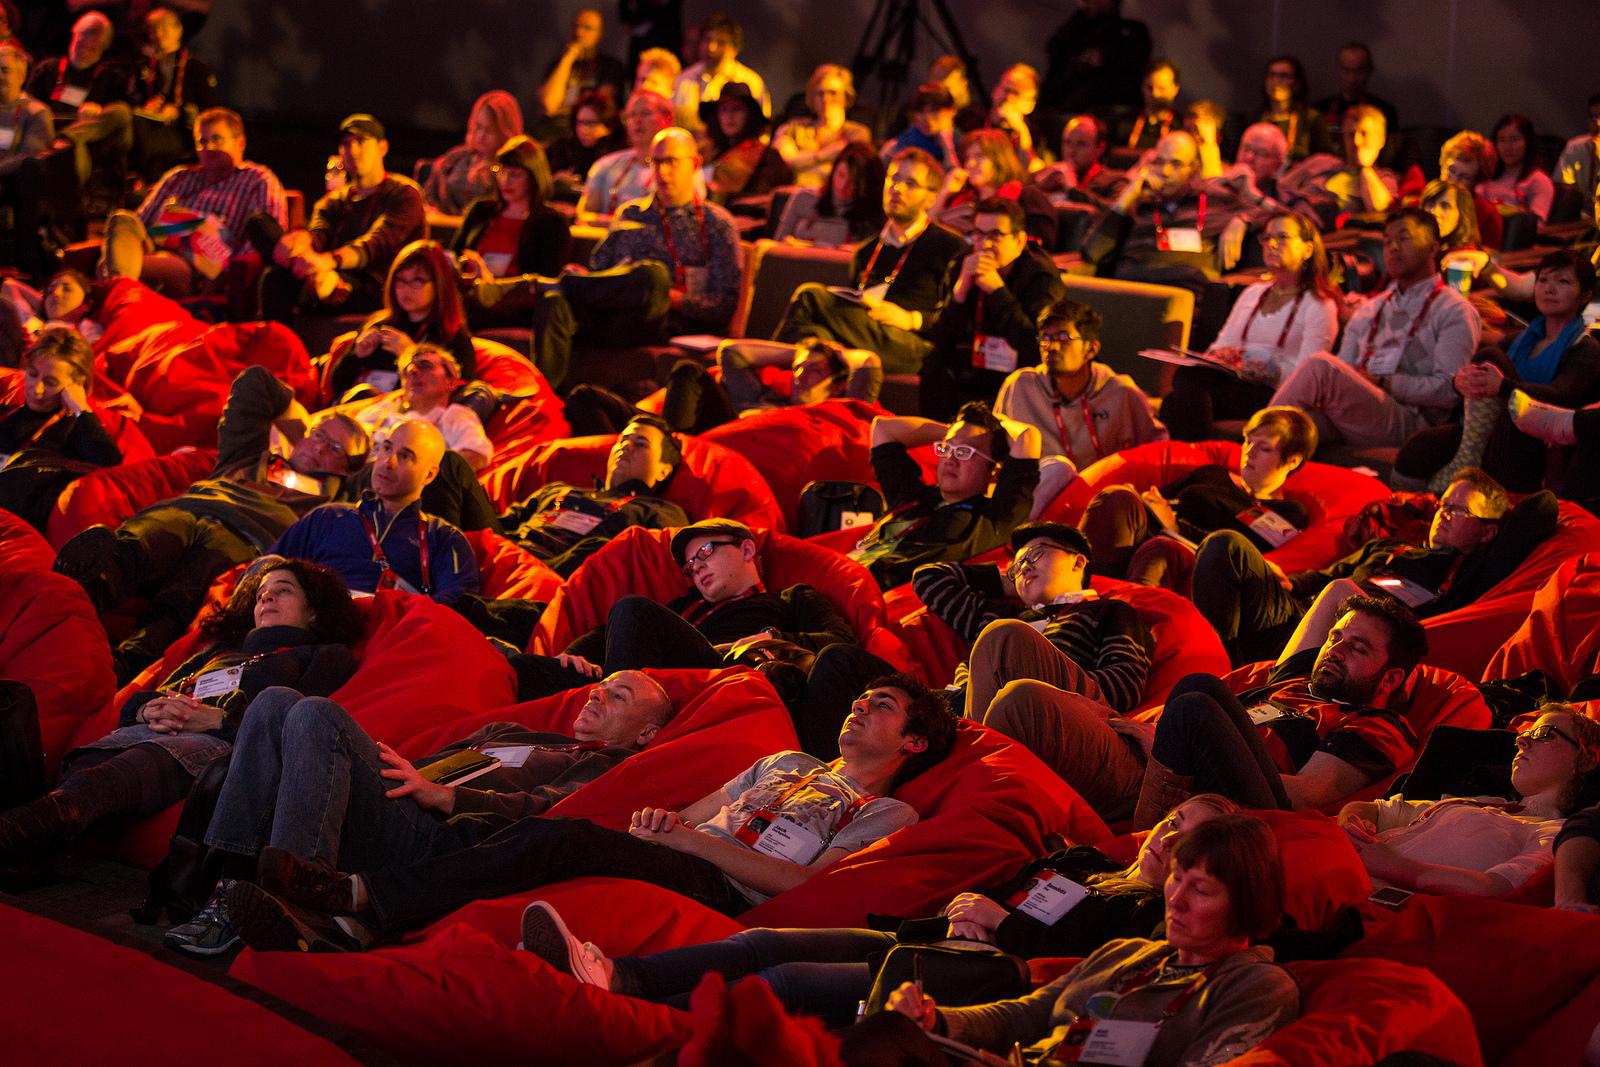 TEDActive 2015 attendees enjoy their bean bag seats. Photo: Marla Aufmuth/TED